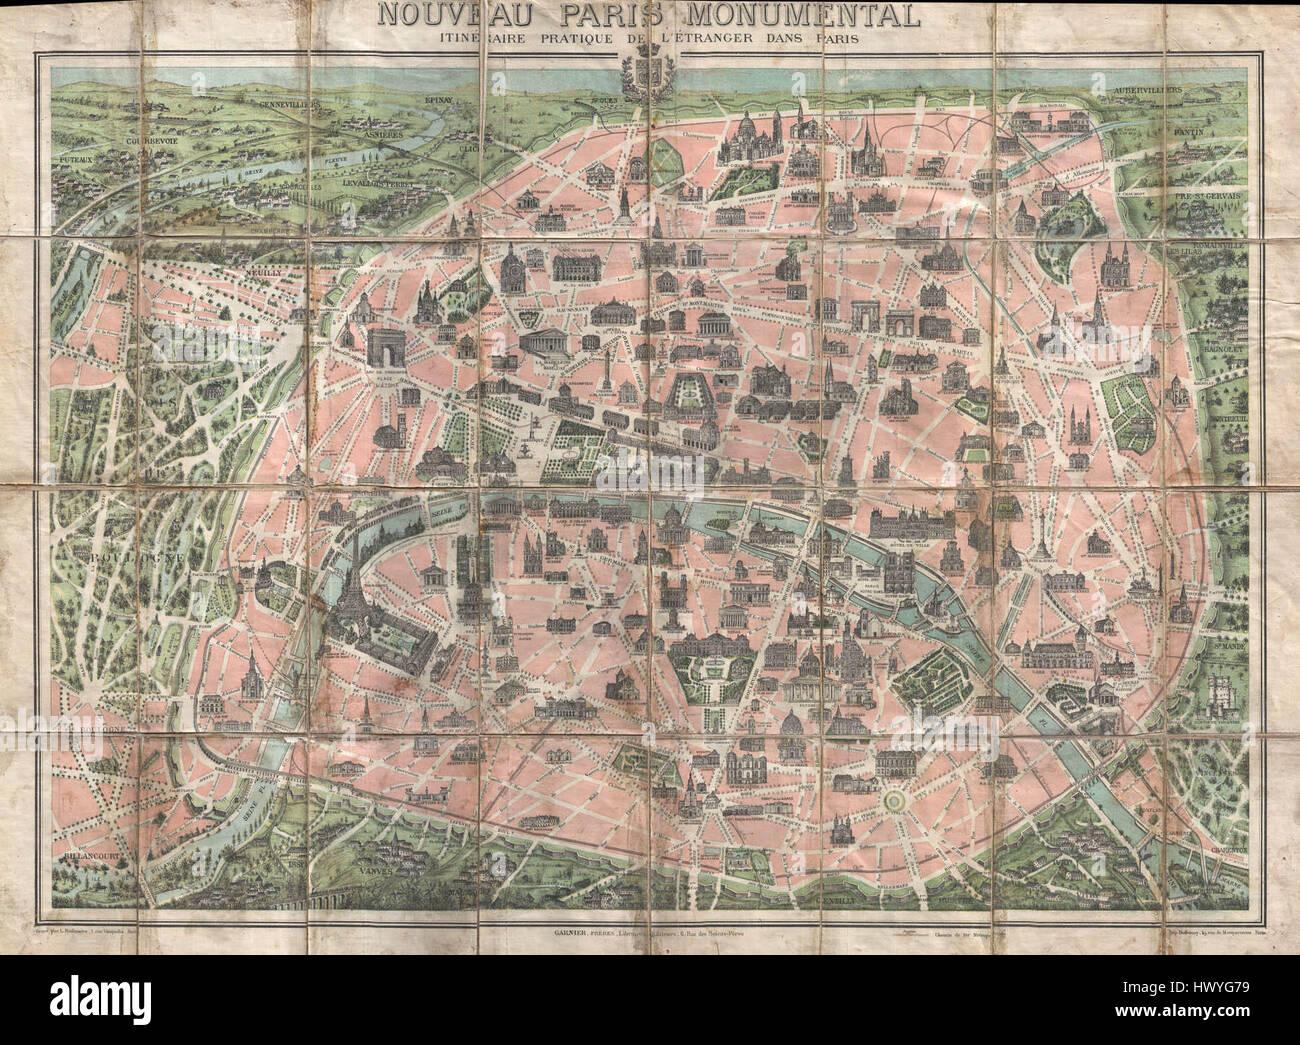 Map Of France Eiffel Tower.1900 Garnier Pocket Map Or Plan Of Paris France Eiffel Tower And